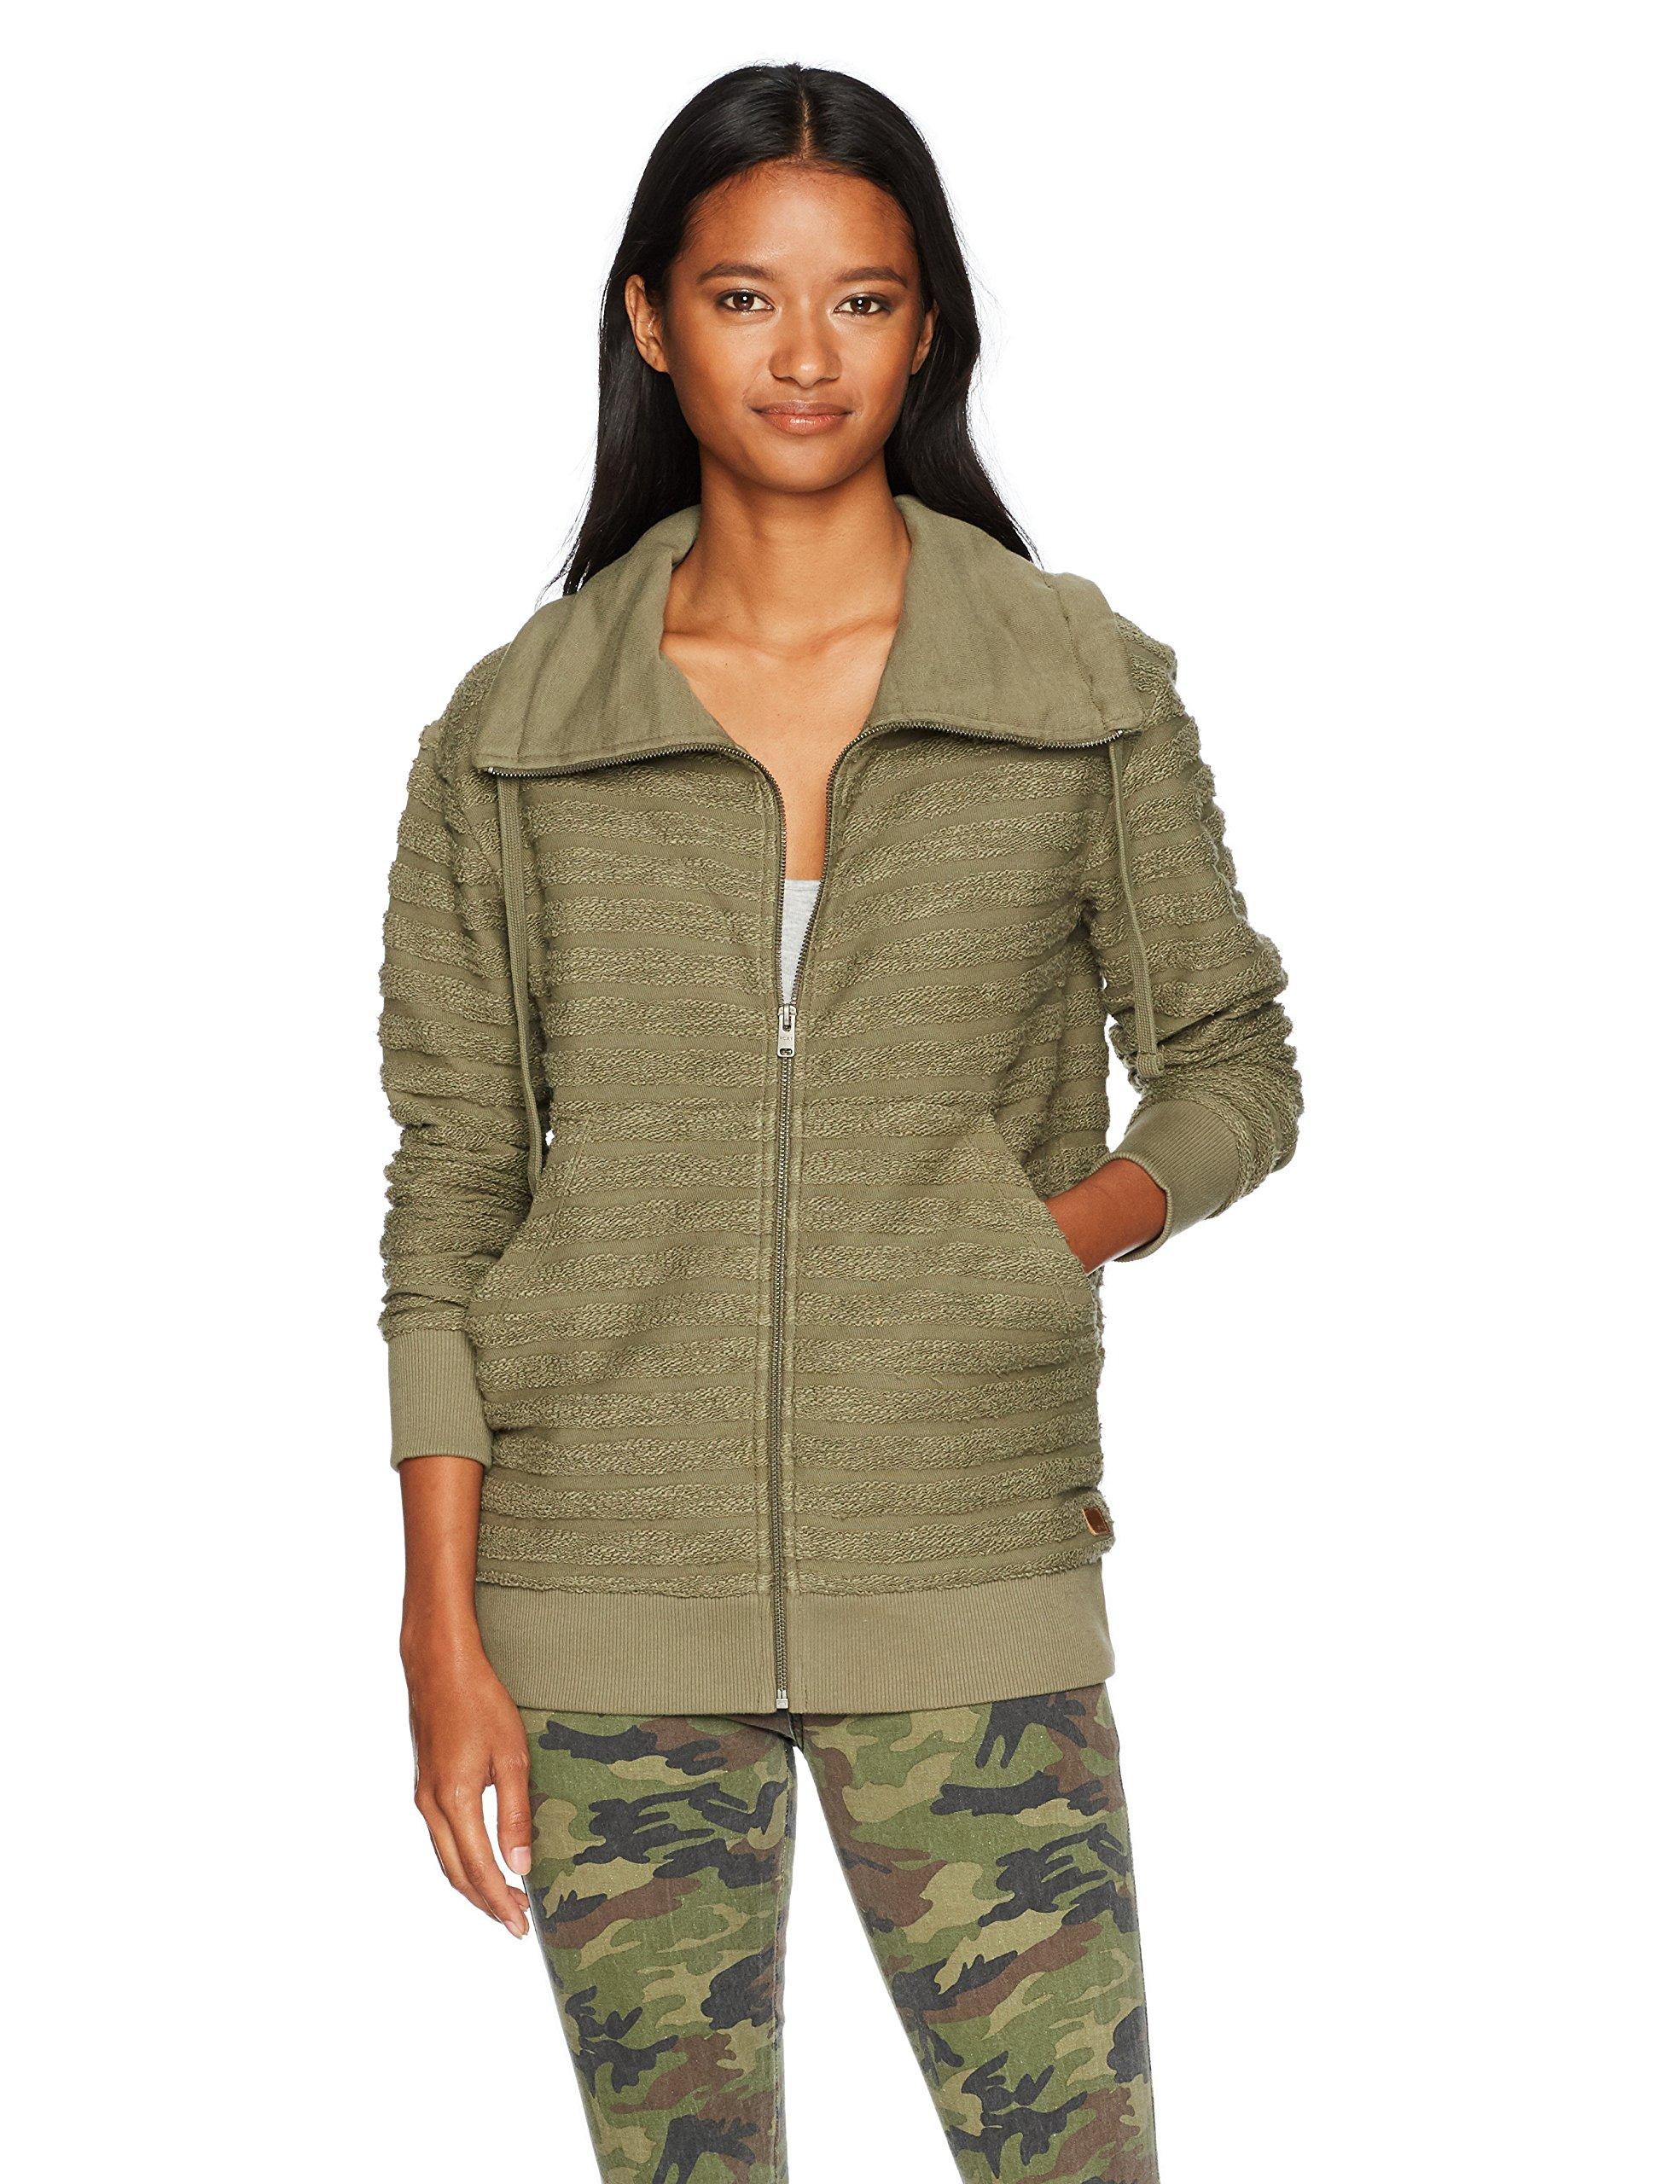 Roxy Women's Lunar Patrol Zip up Fleece Sweatshirt, Dusty Olive, S